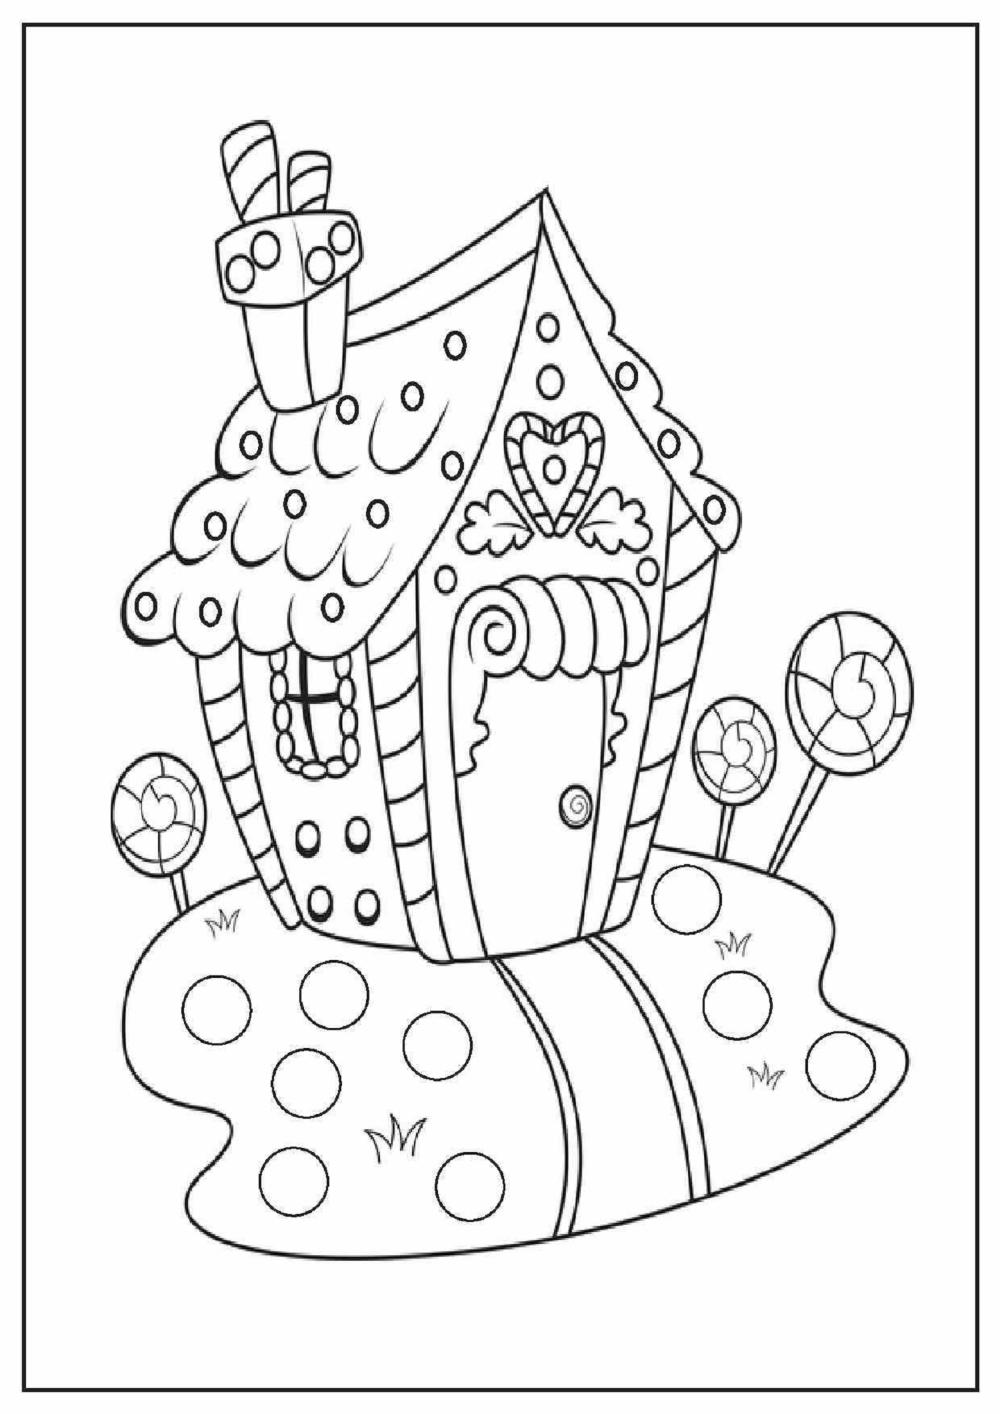 Christmas Activities for Kids for Fun Christmas coloring